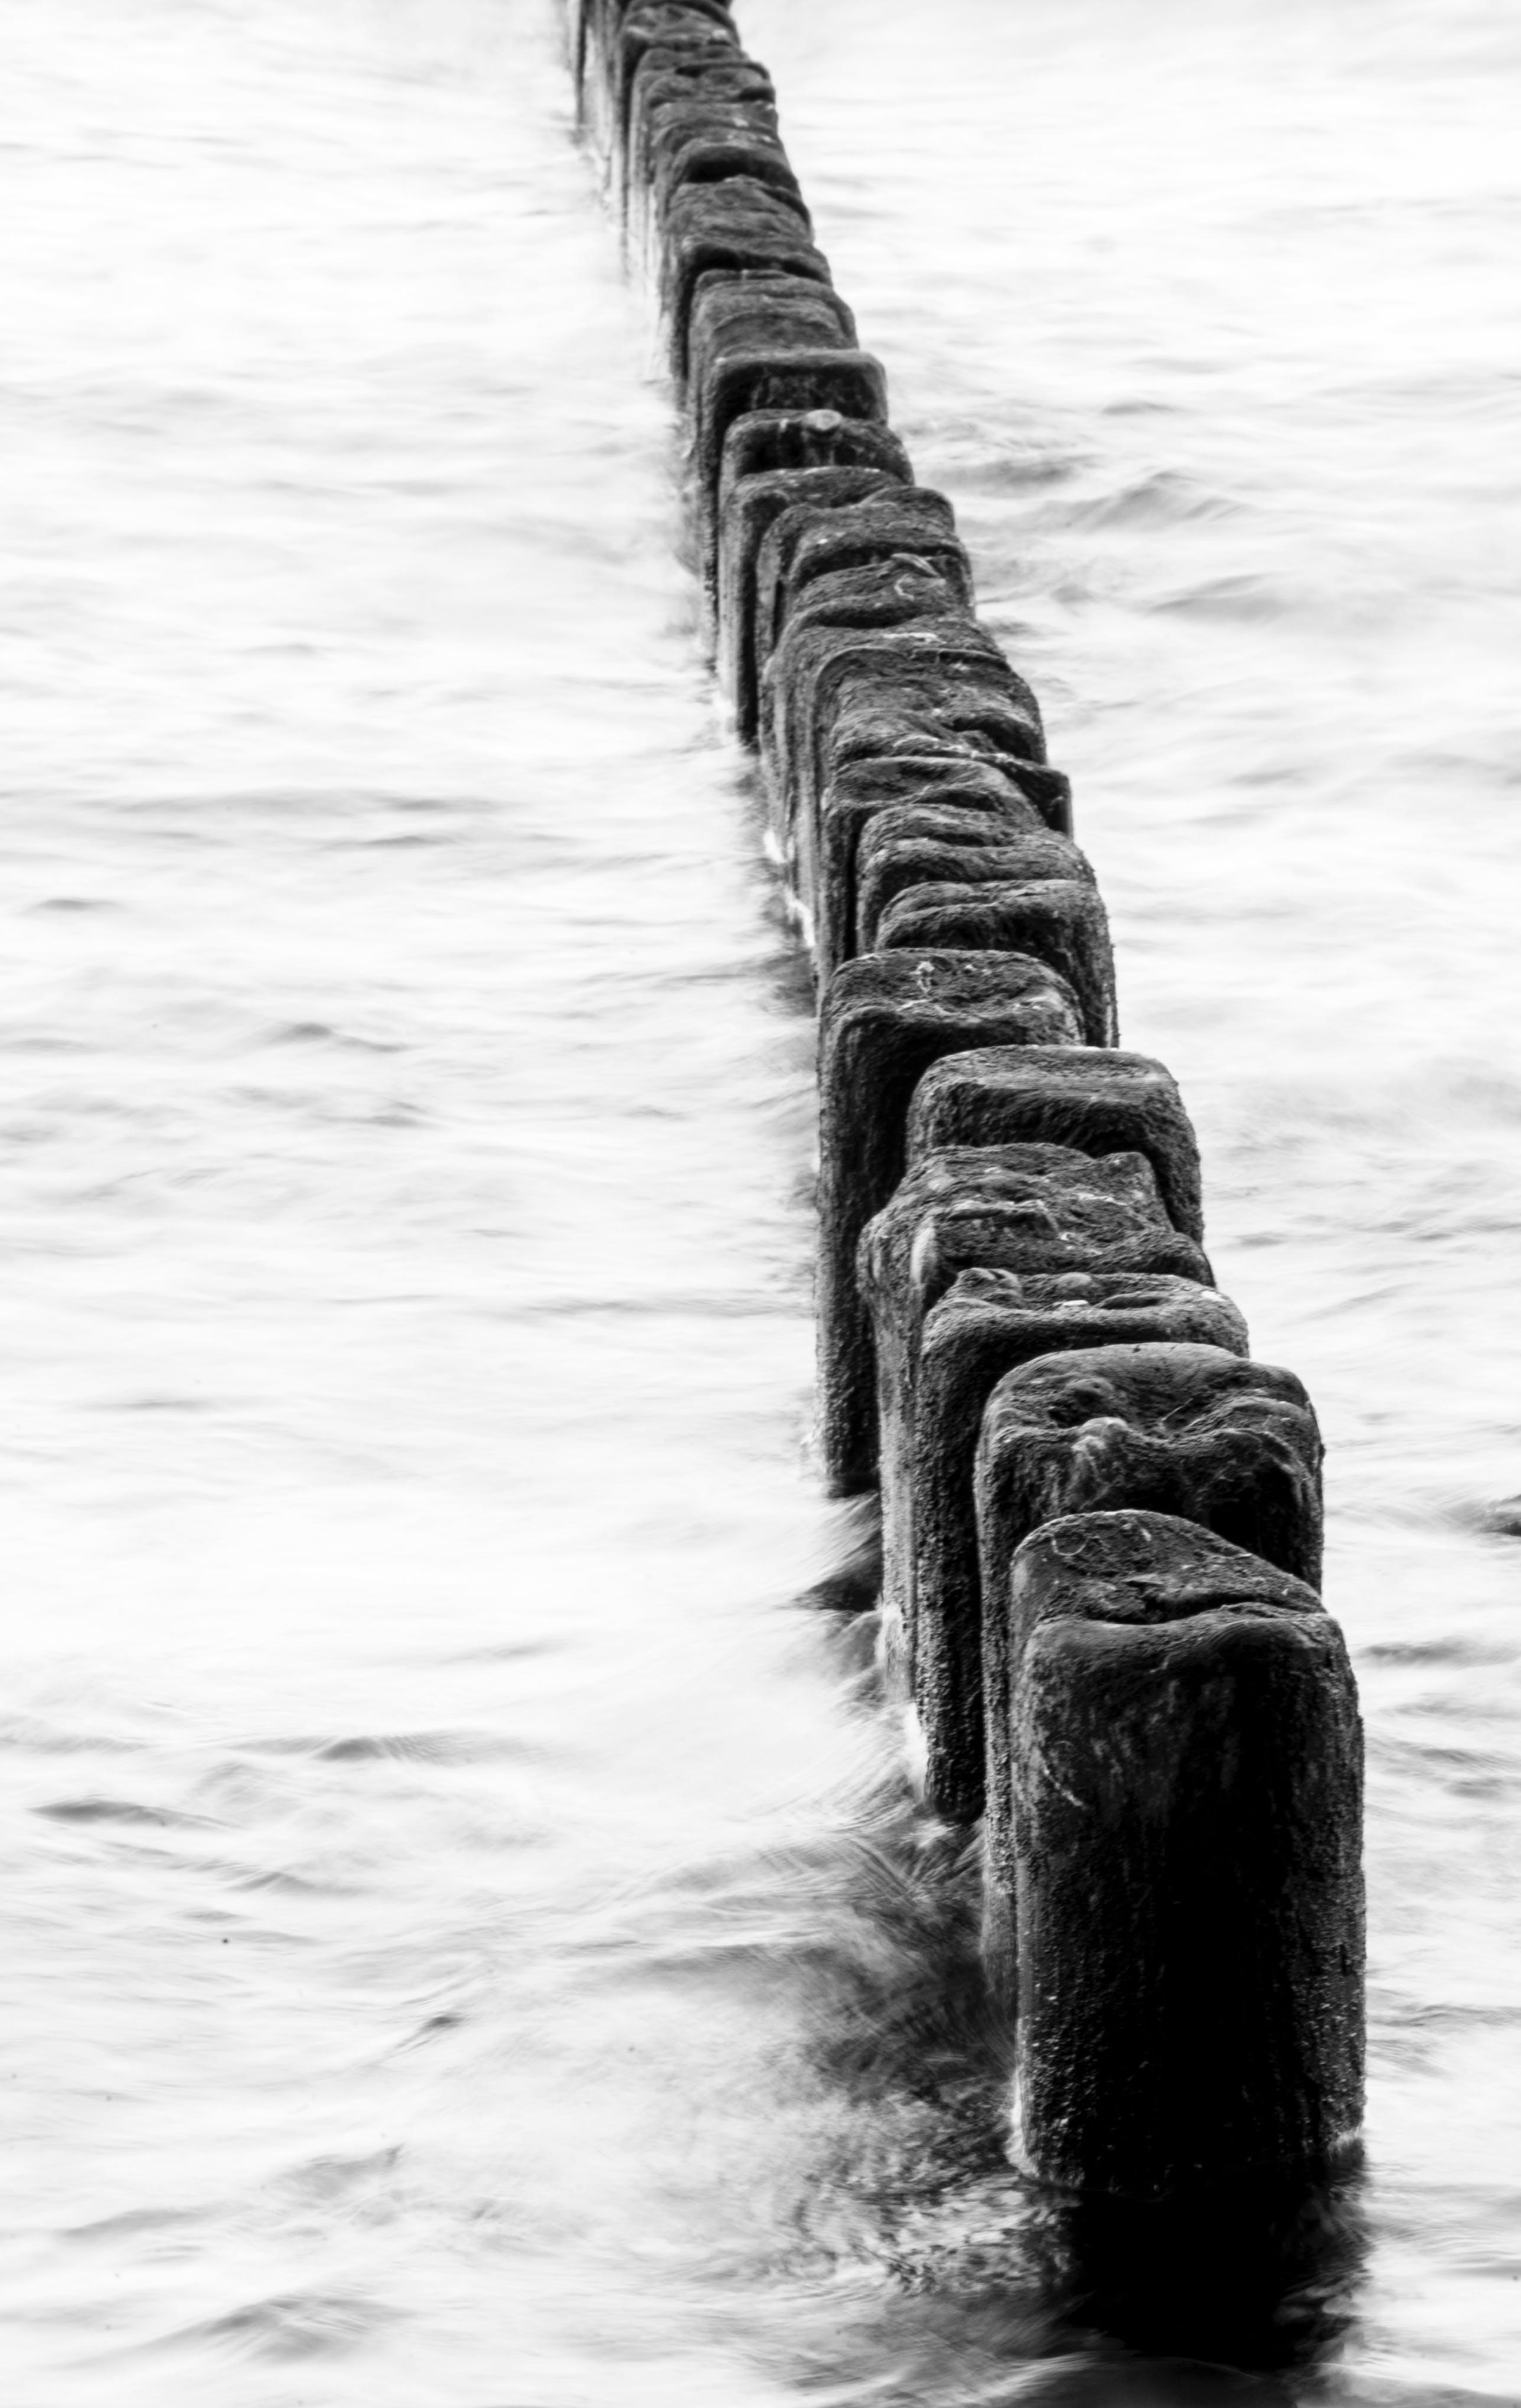 Free stock photo of Baltic Sea, sea